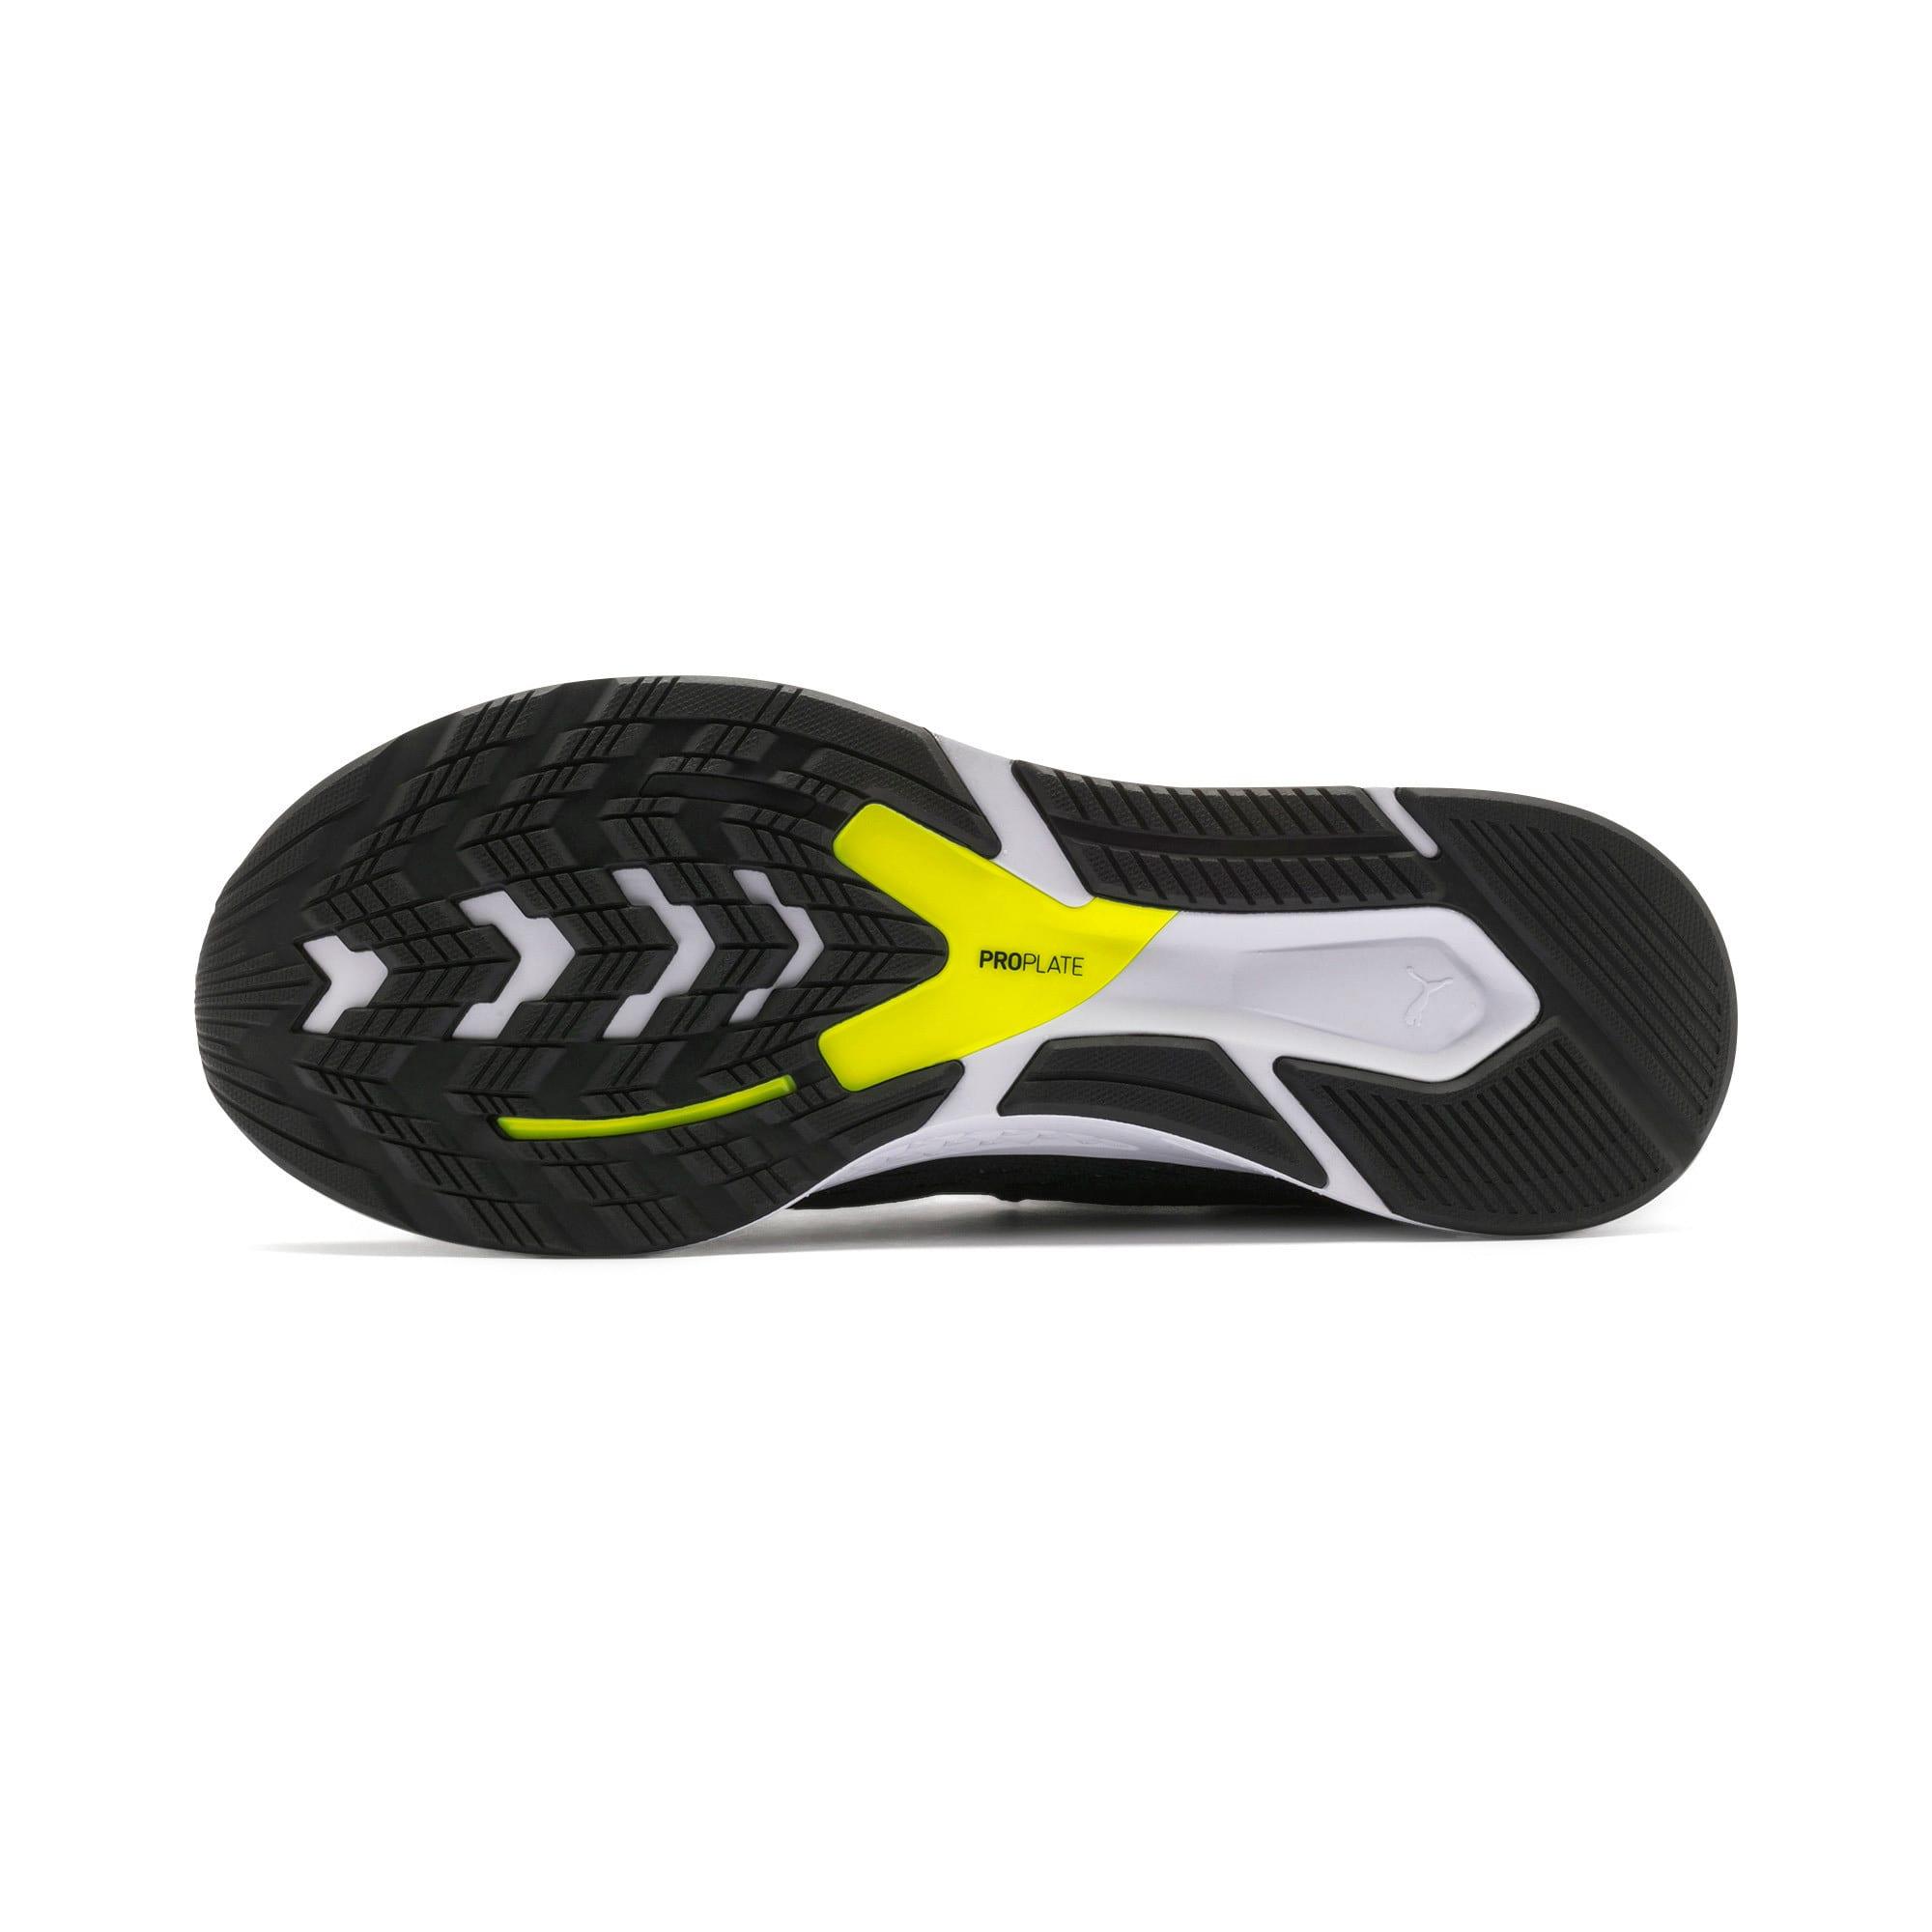 Thumbnail 4 of SPEED 500 Men's Running Shoes, Black-White-Red-Yellow, medium